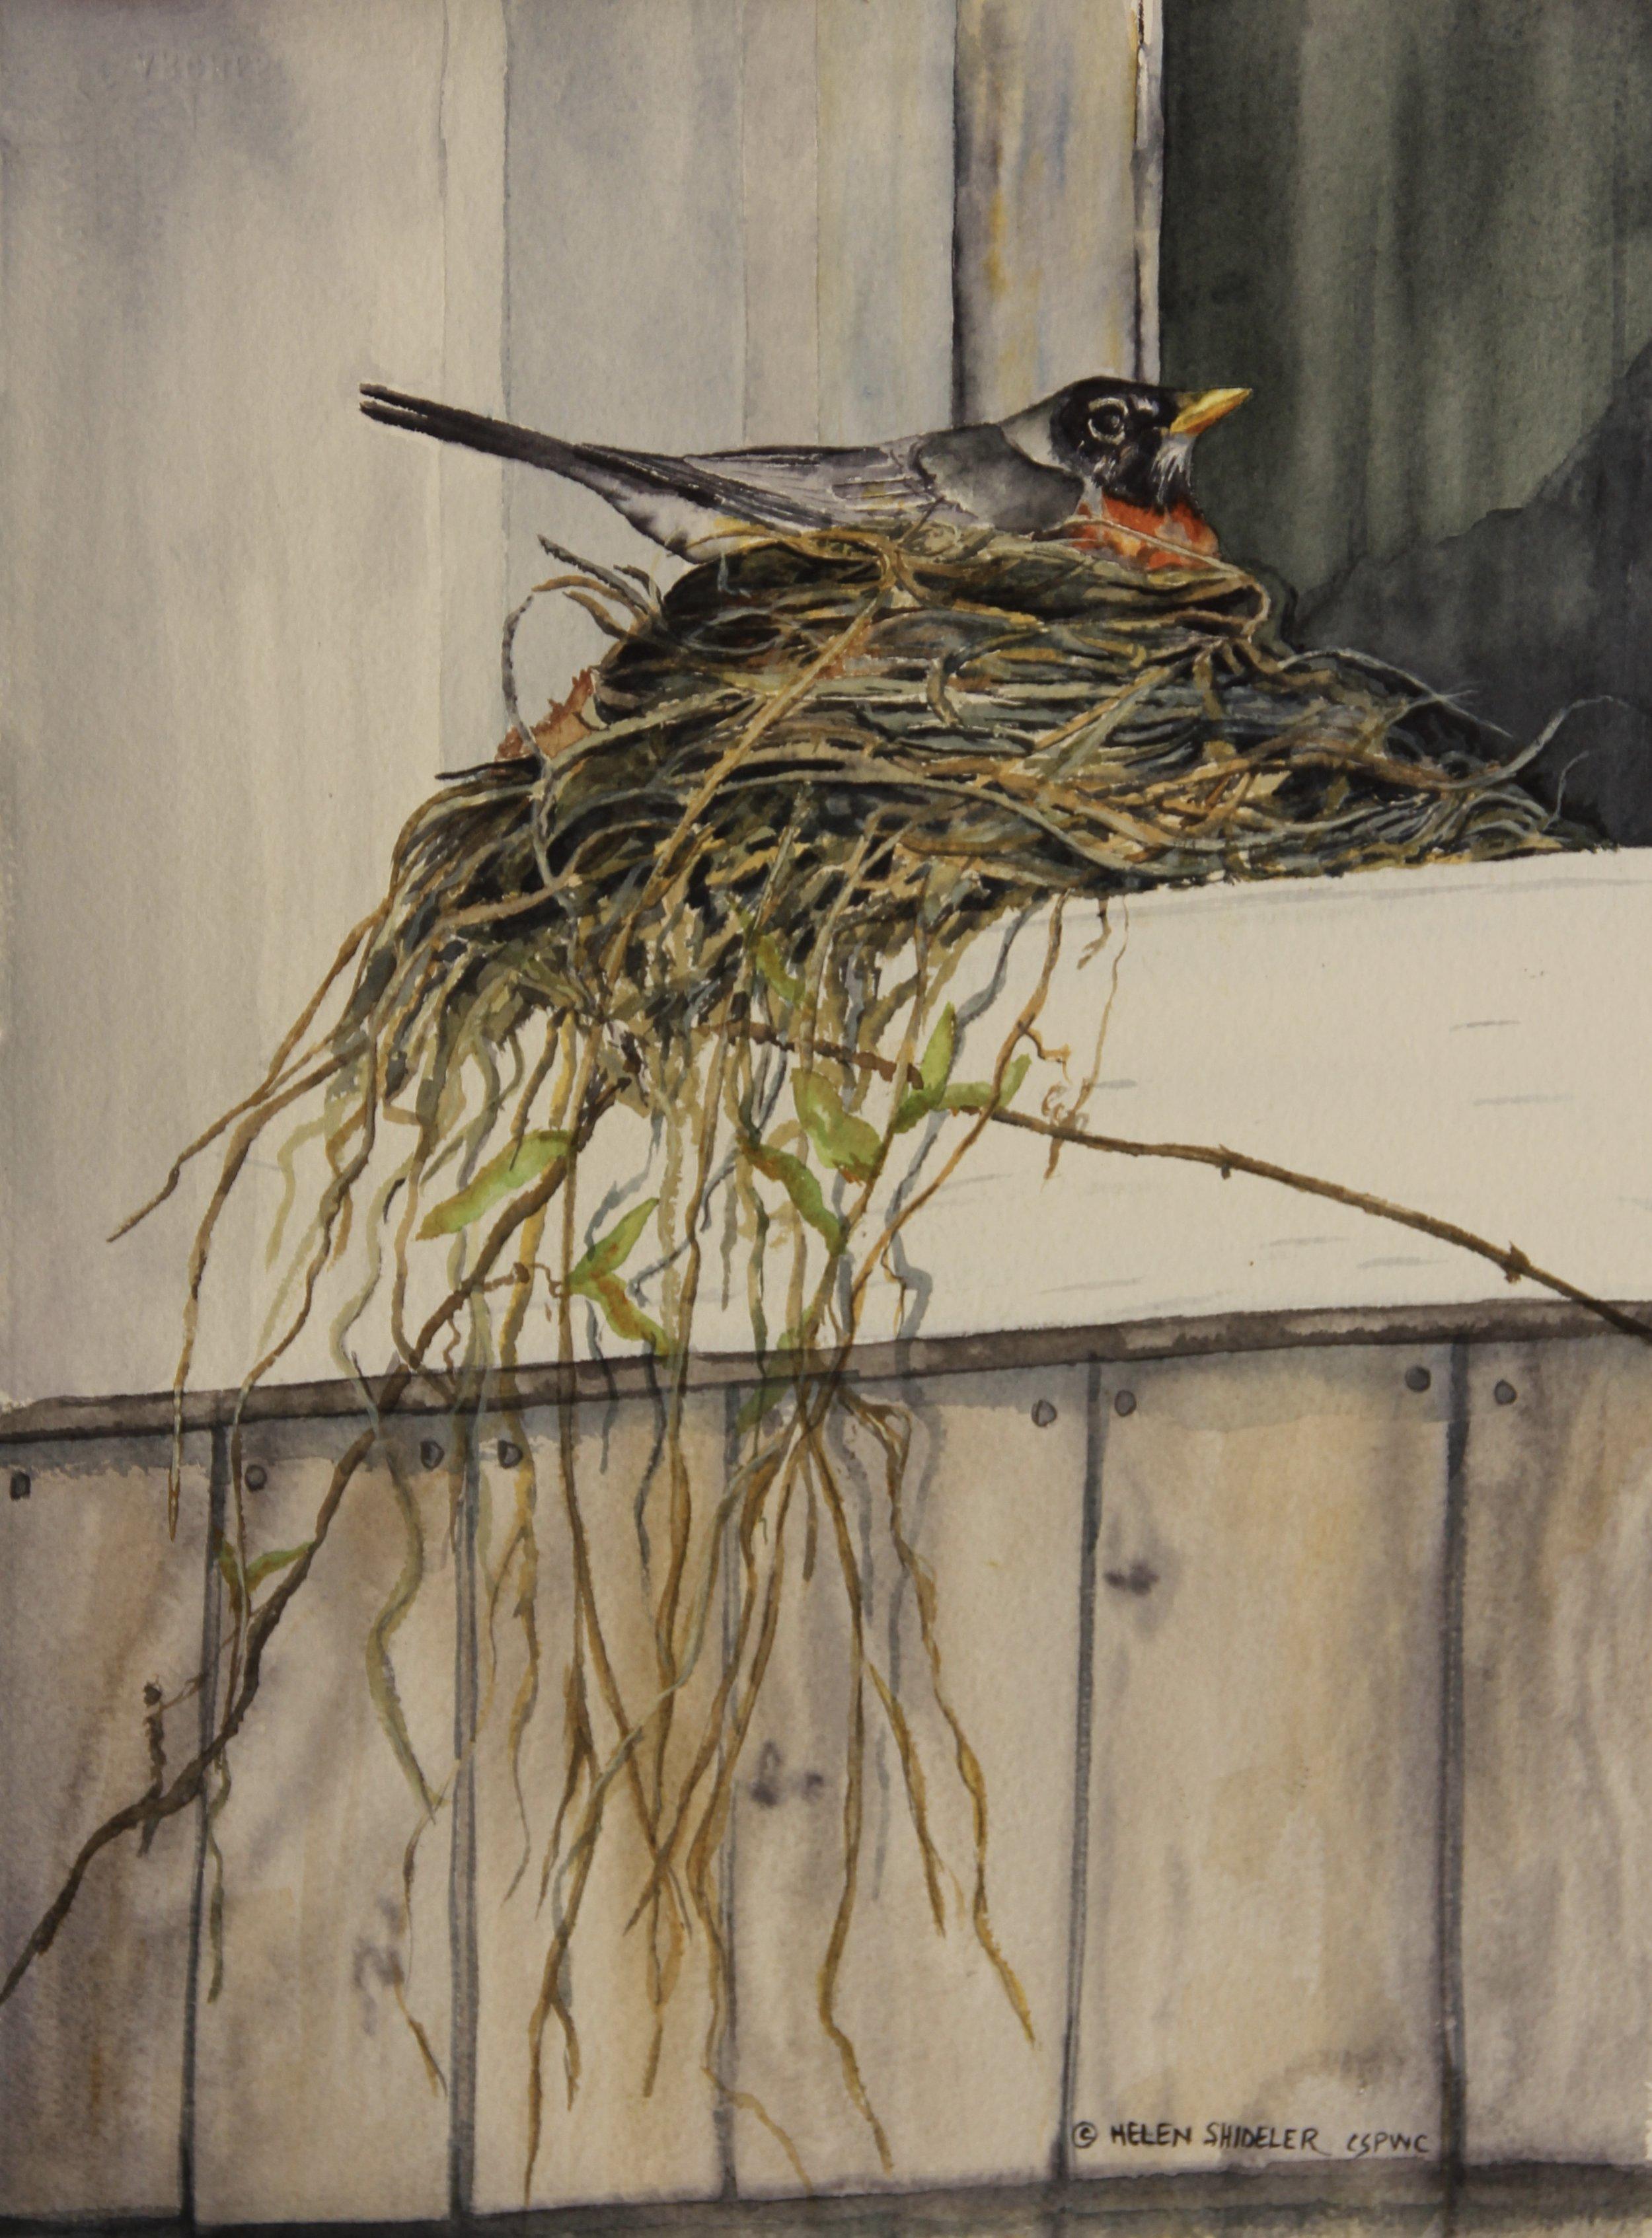 Anxiously Waiting by Helen Shideler